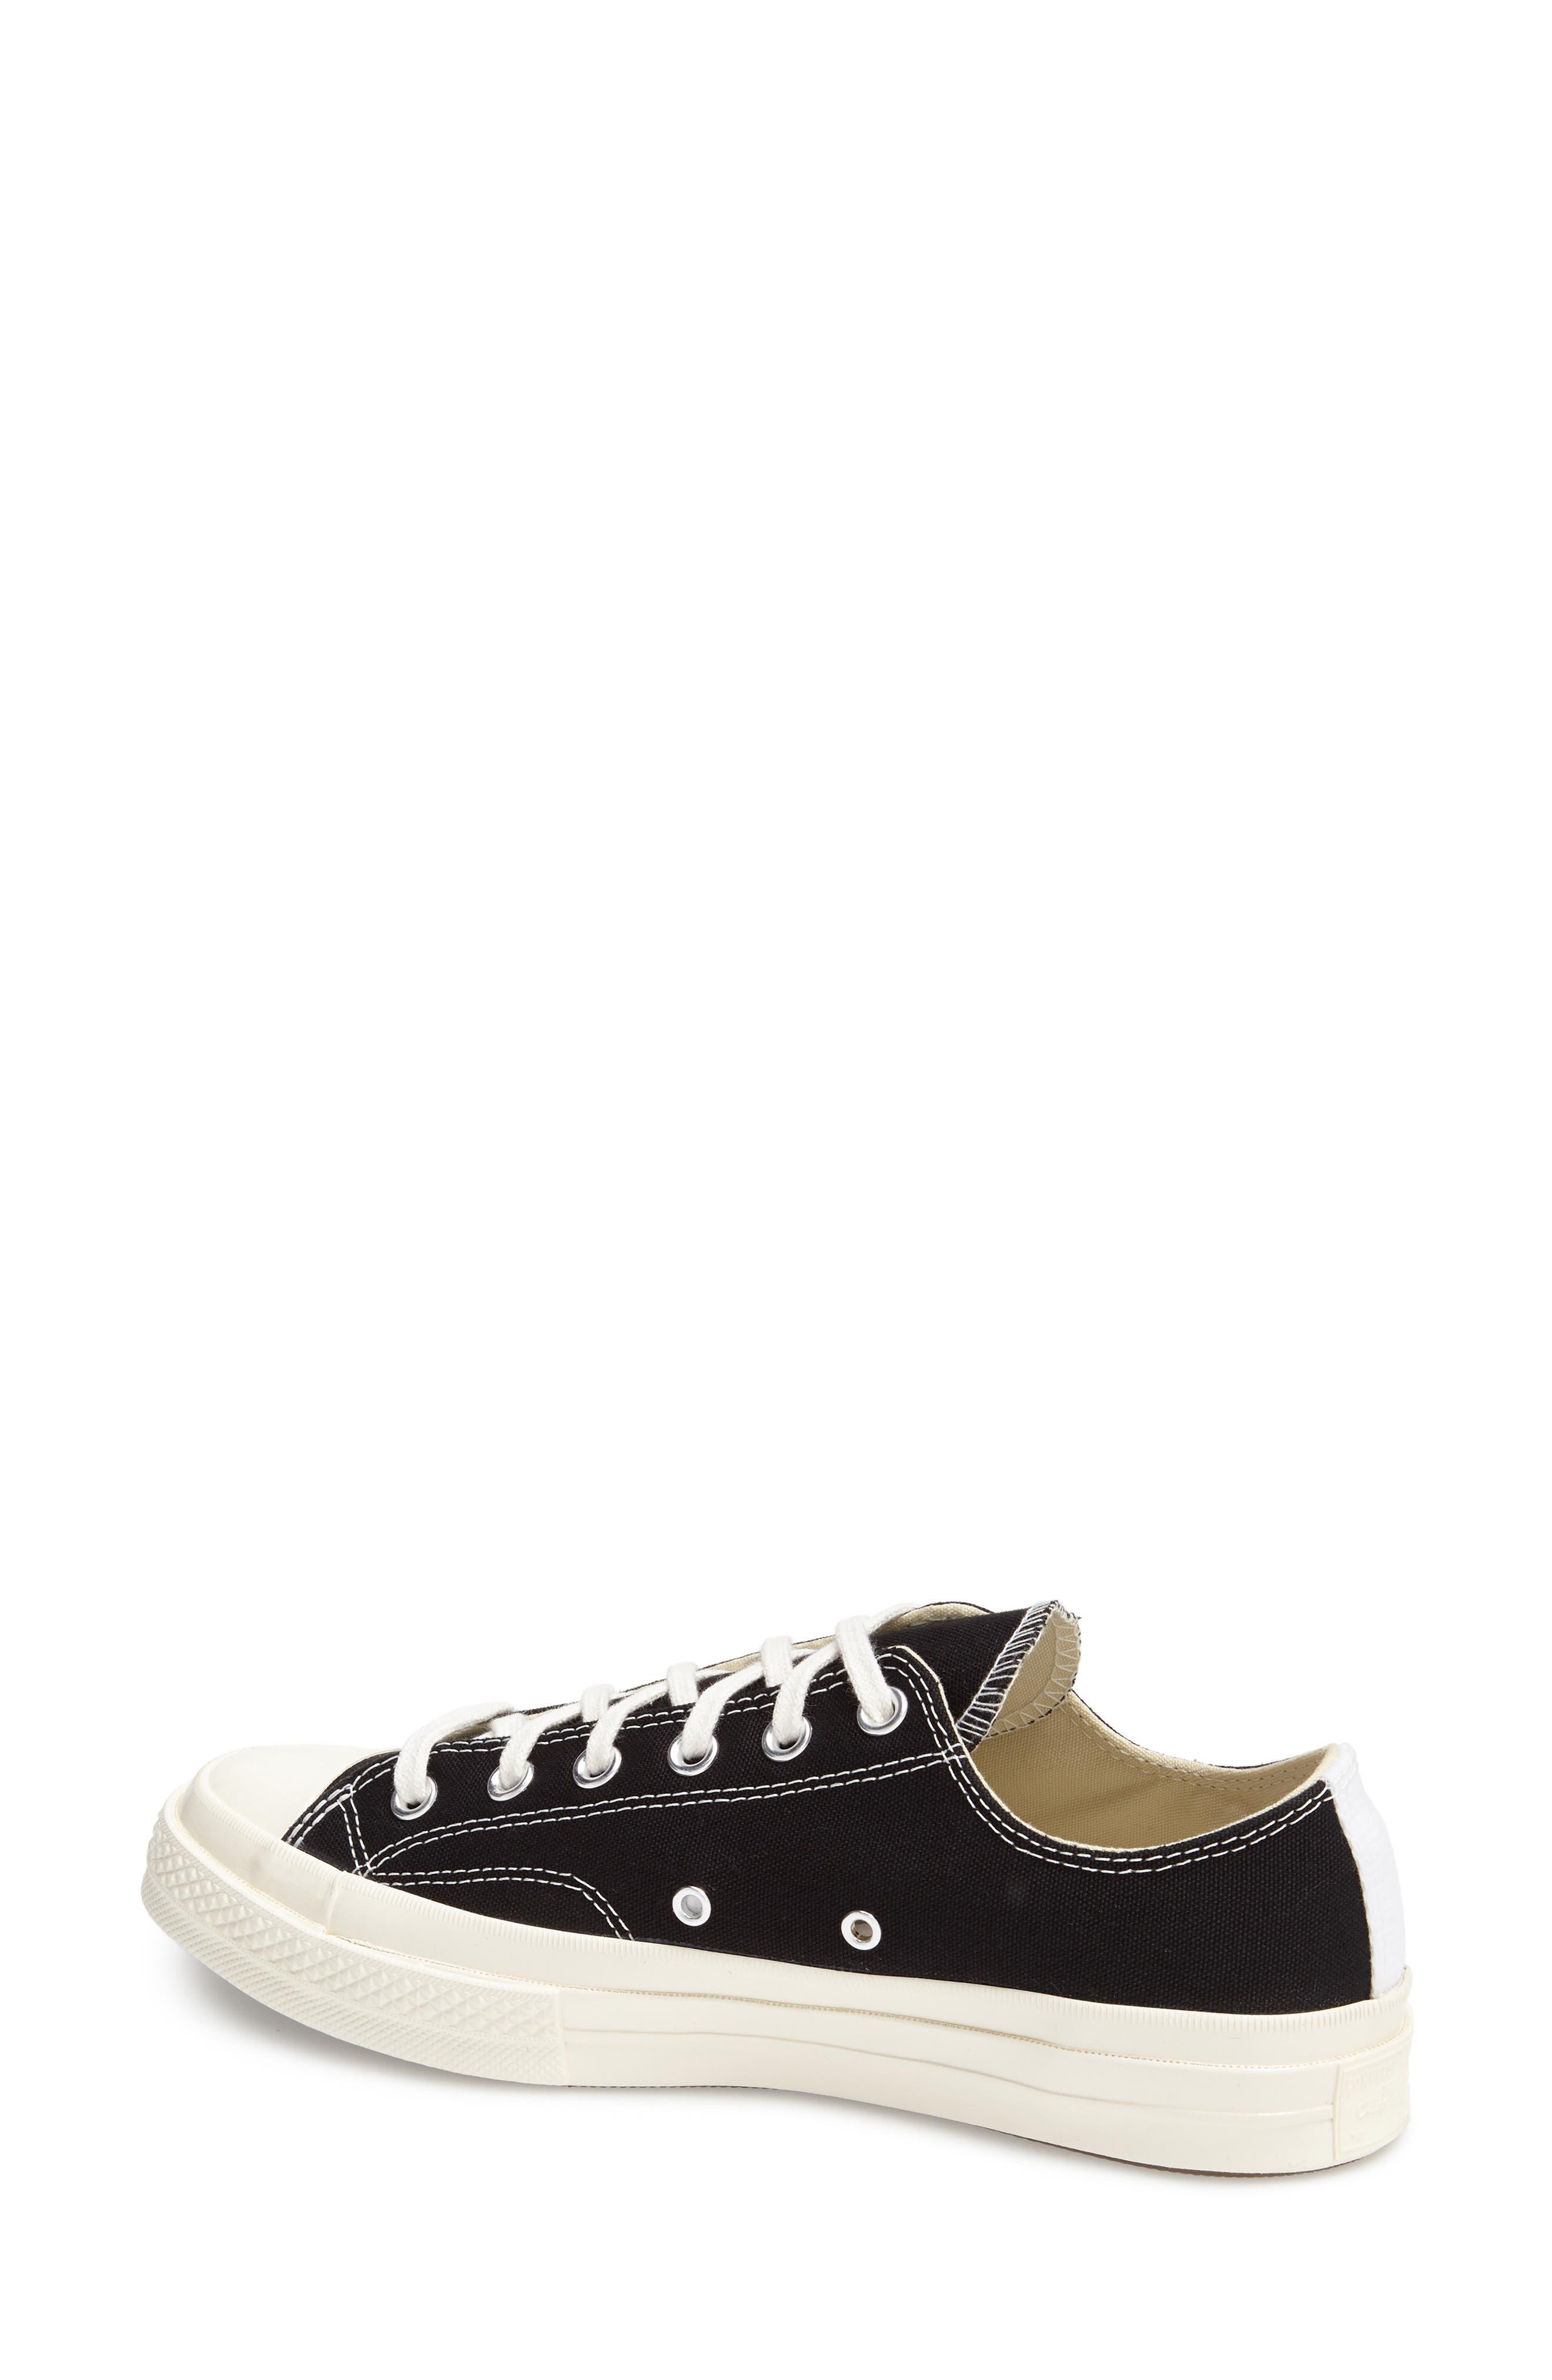 x Converse Chuck Taylor<sup>®</sup> Hidden Heart Low Top Sneaker,                             Main thumbnail 1, color,                             BLACK